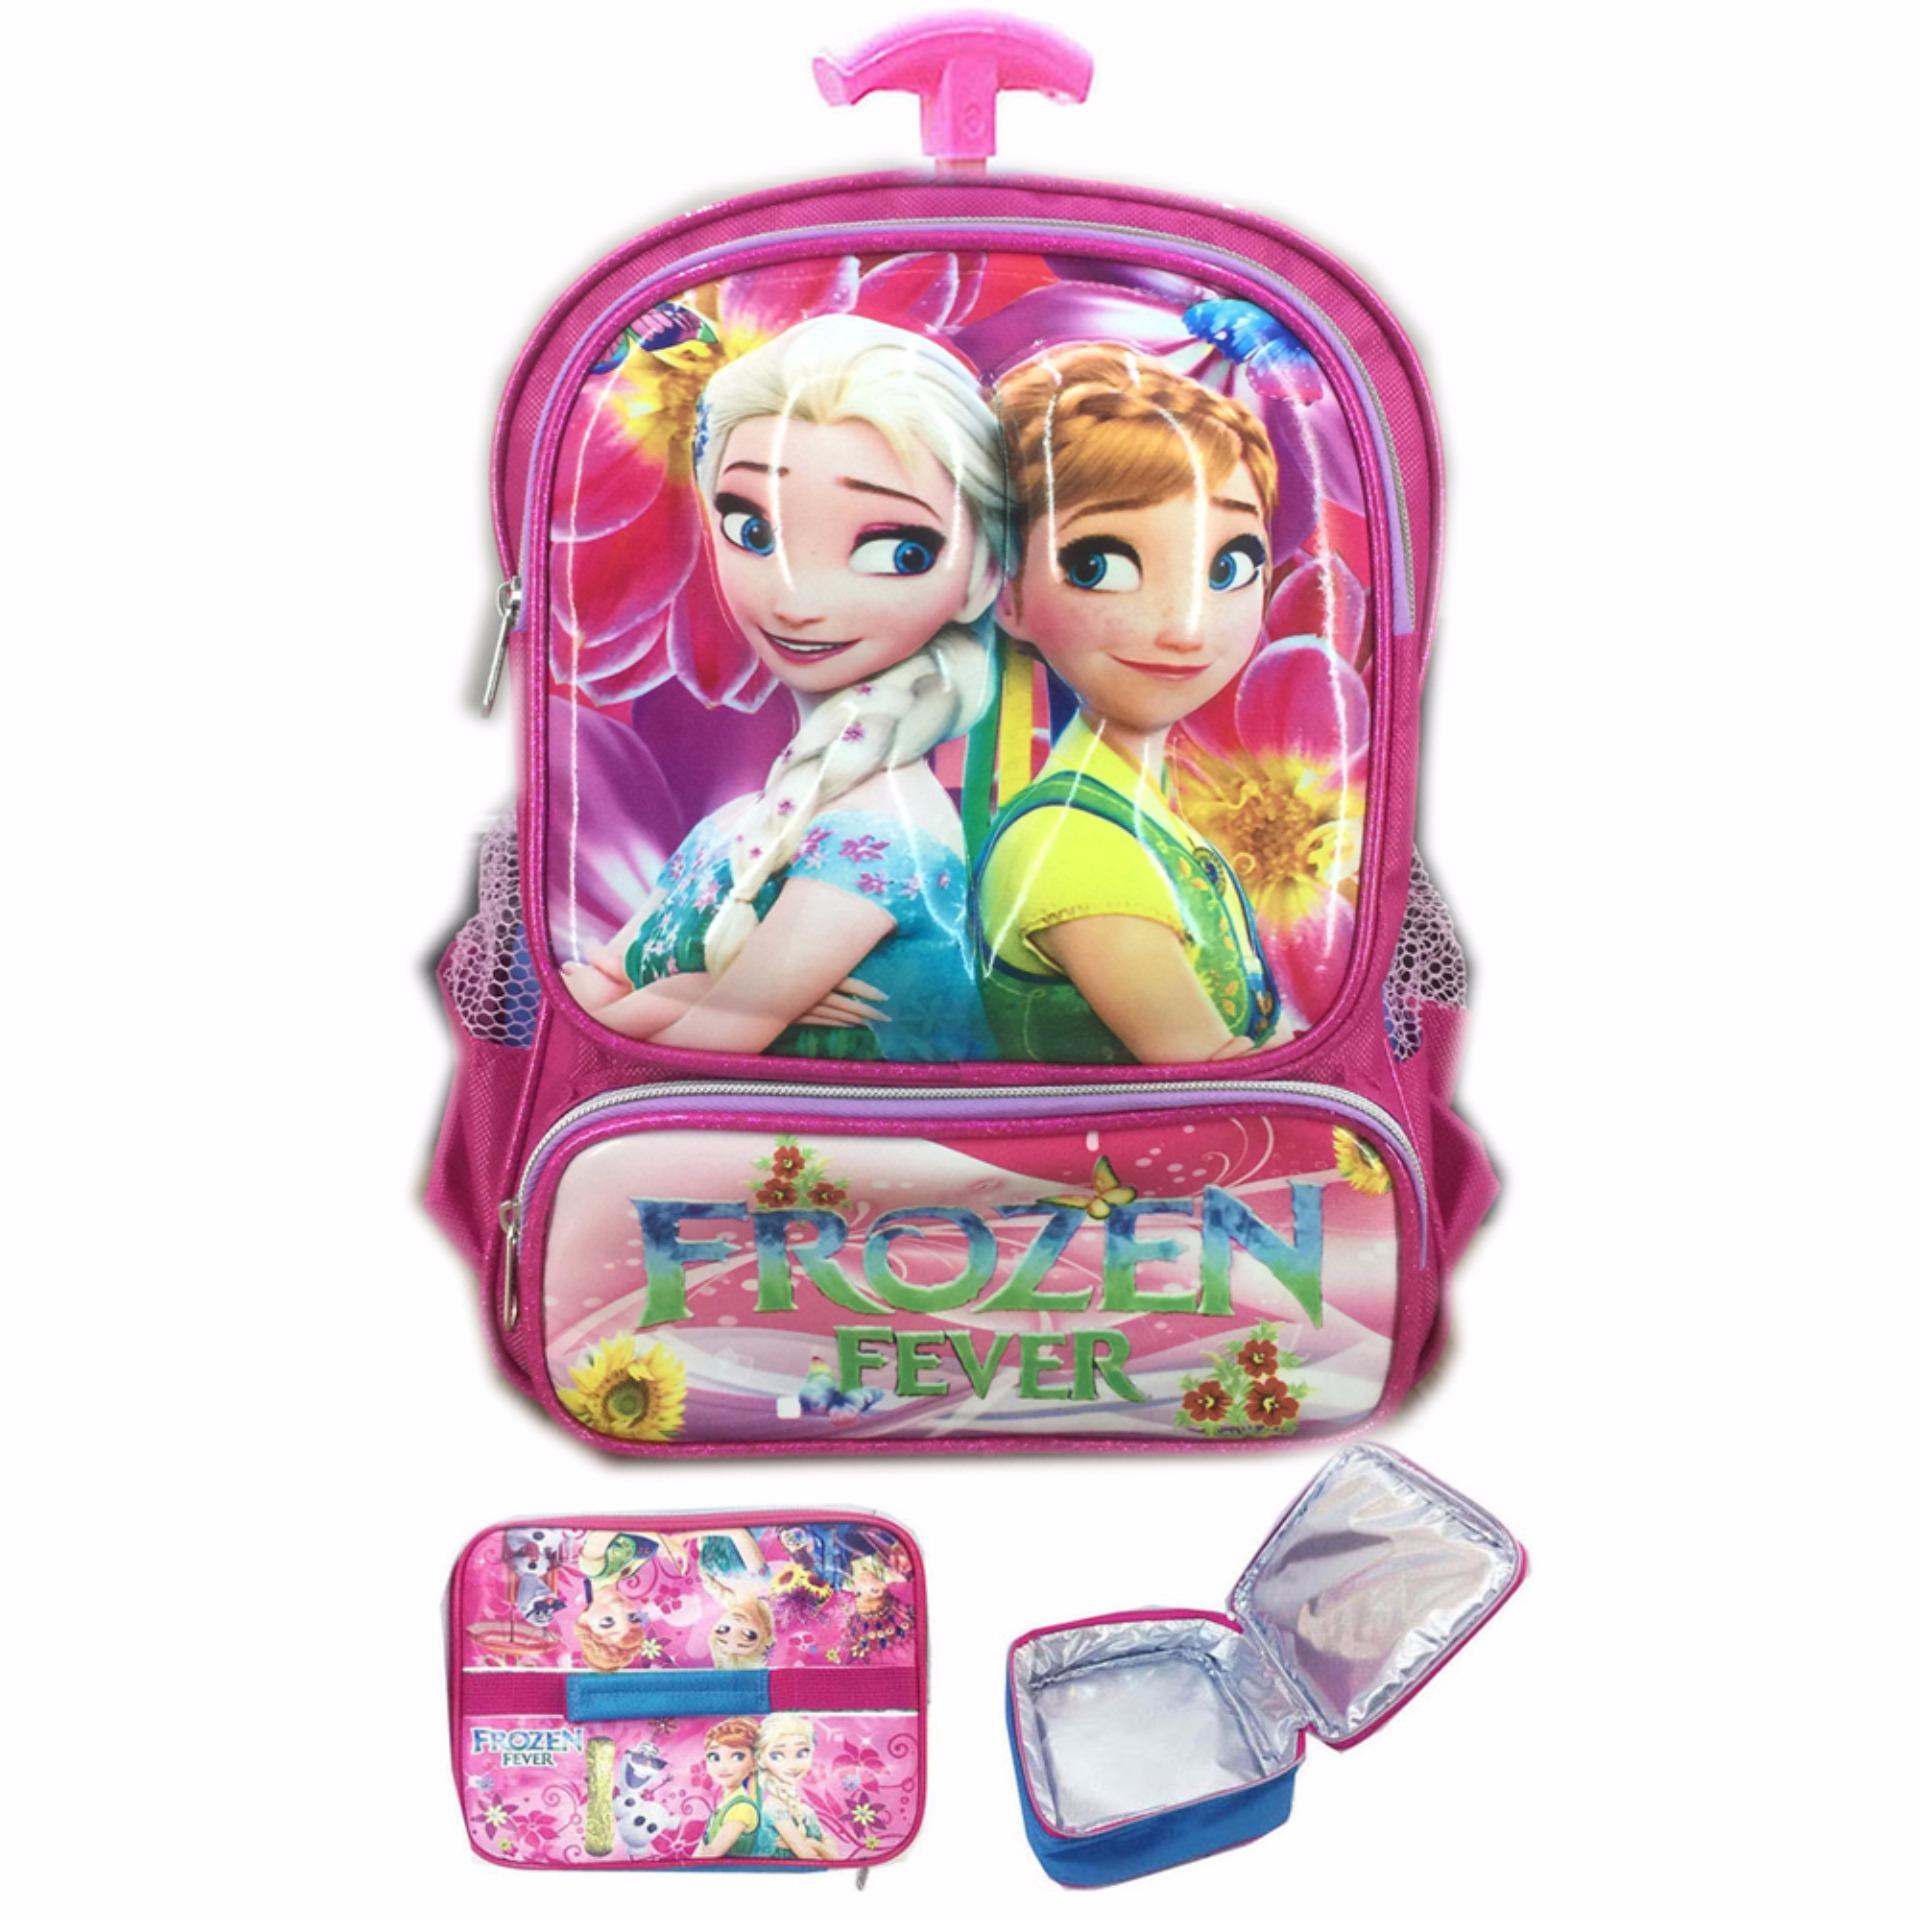 Kuat dan bahan nya IMPORT BGC Tas Troley Sekolah Anak TK Frozen Fever 3D Timbul Hard Cover+ Lunch Bag Aluminium Tahan